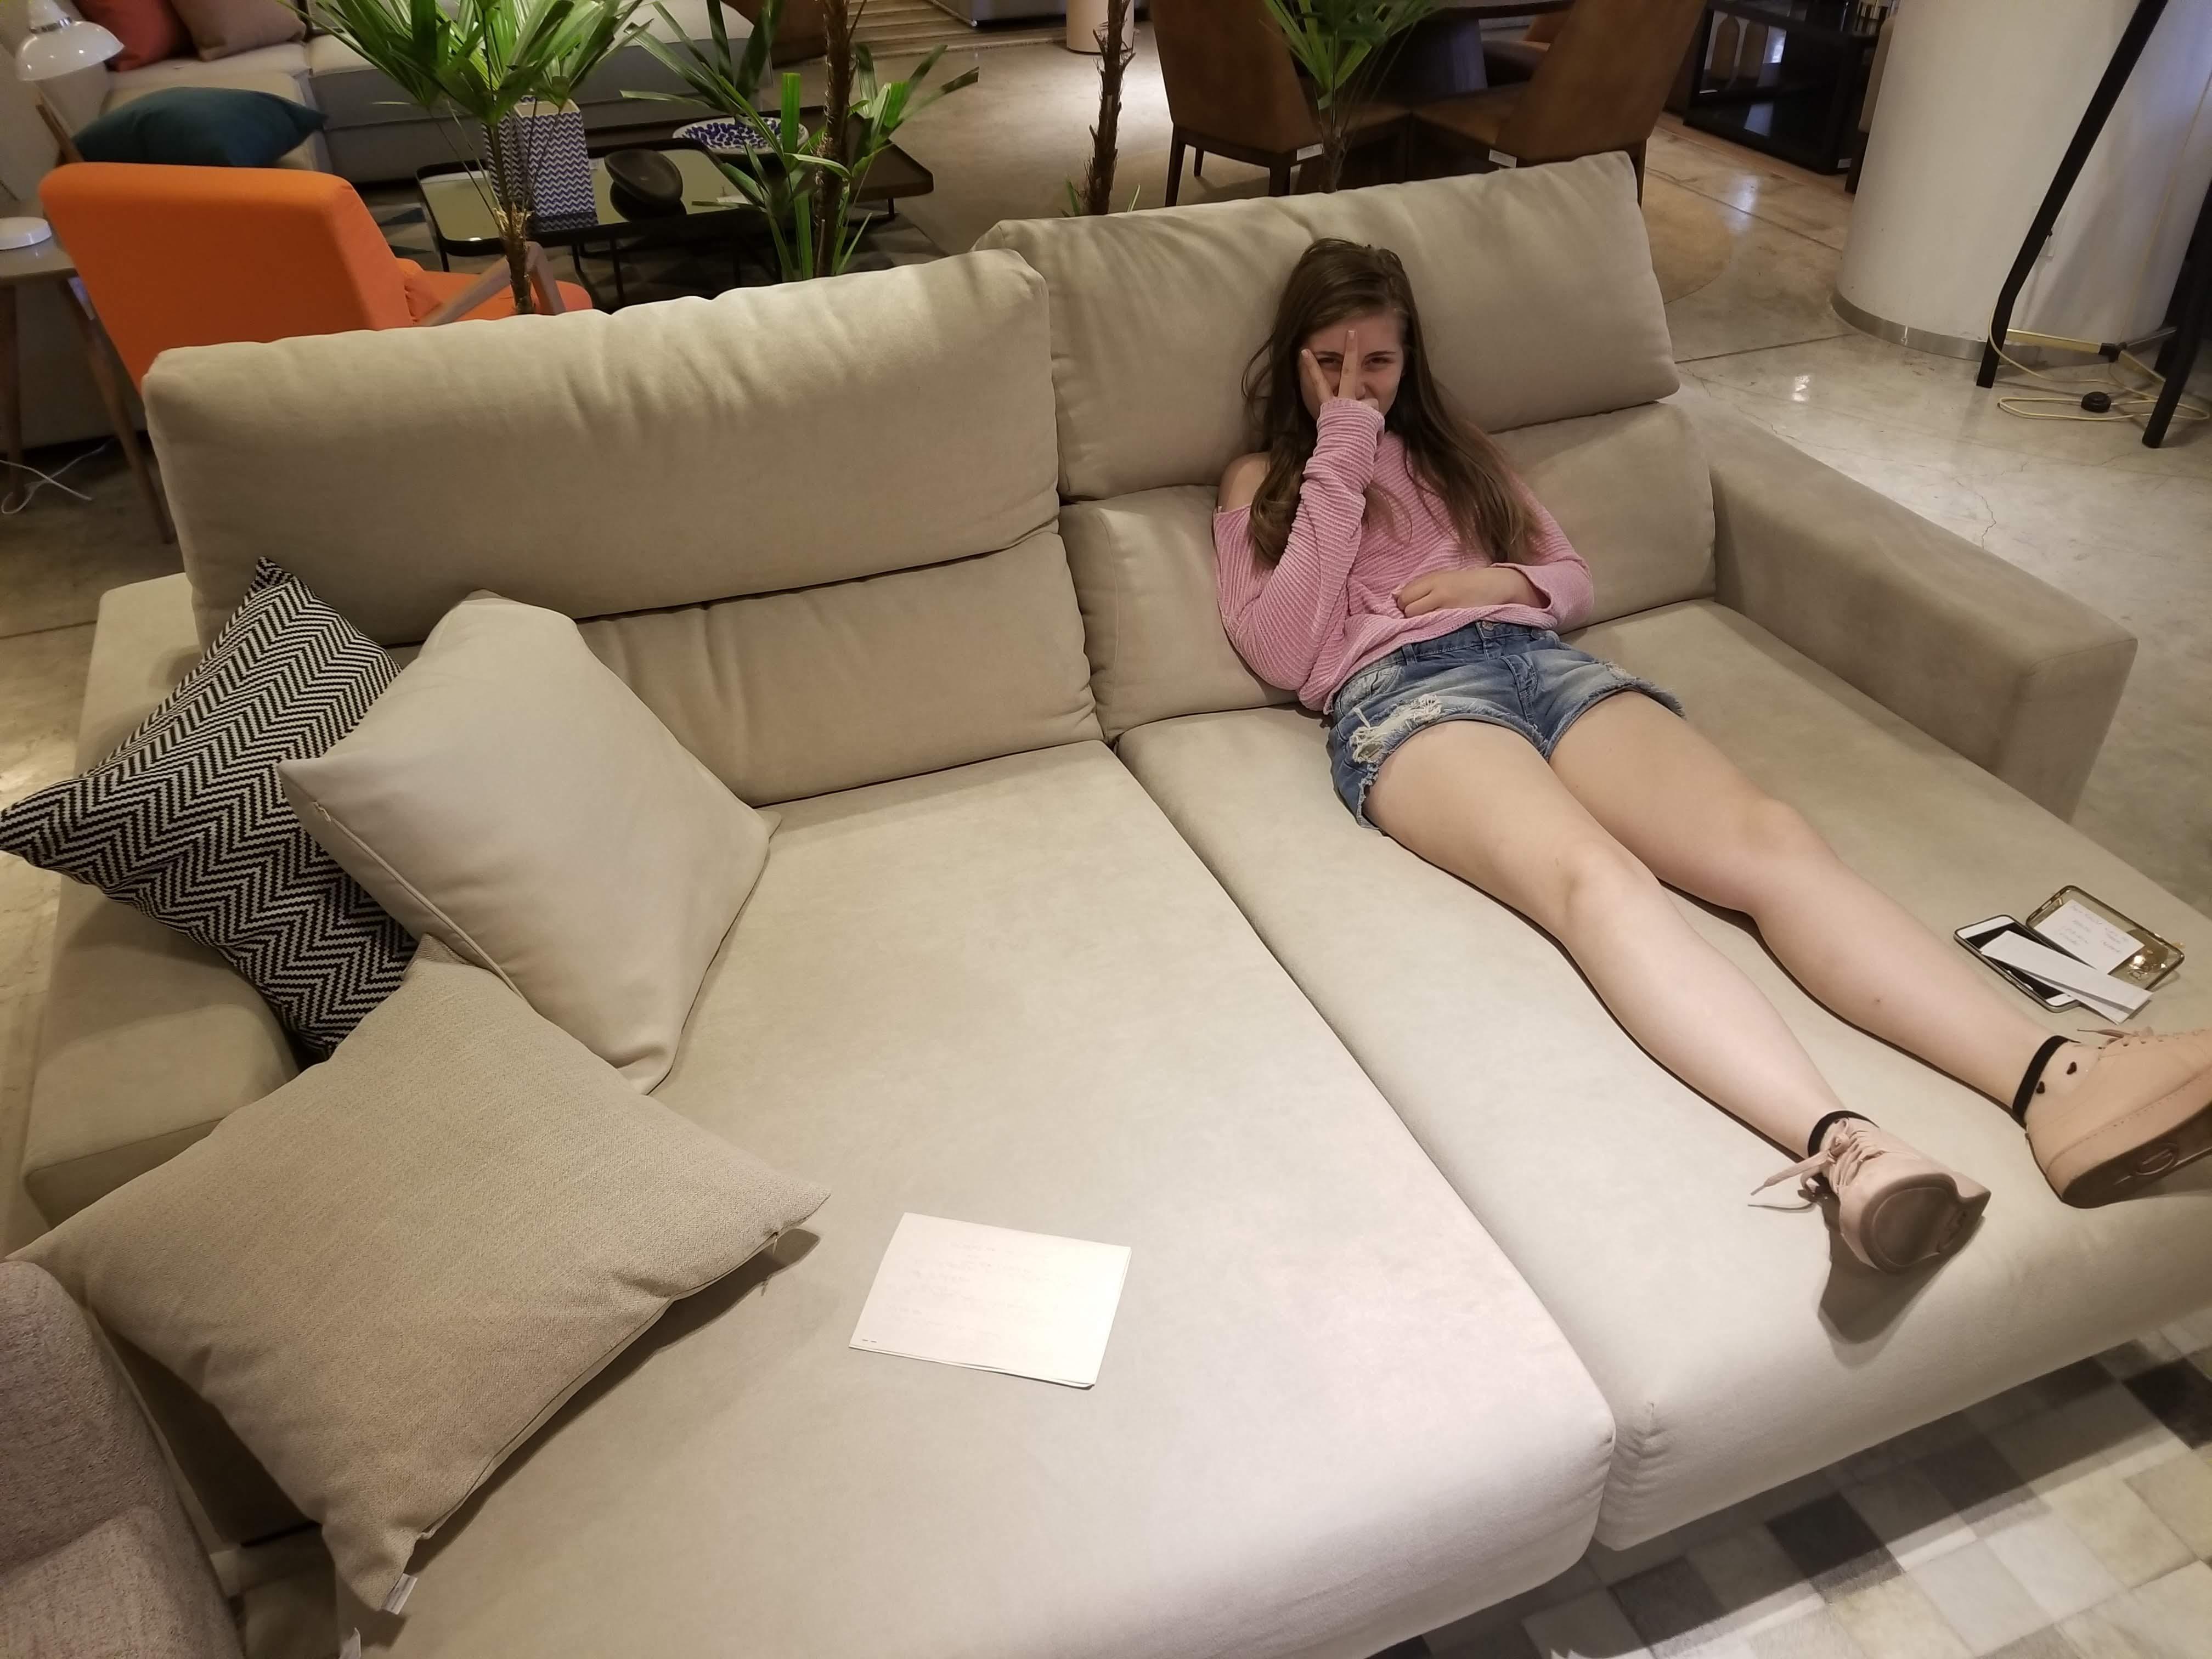 comprar sofá pro apartamento